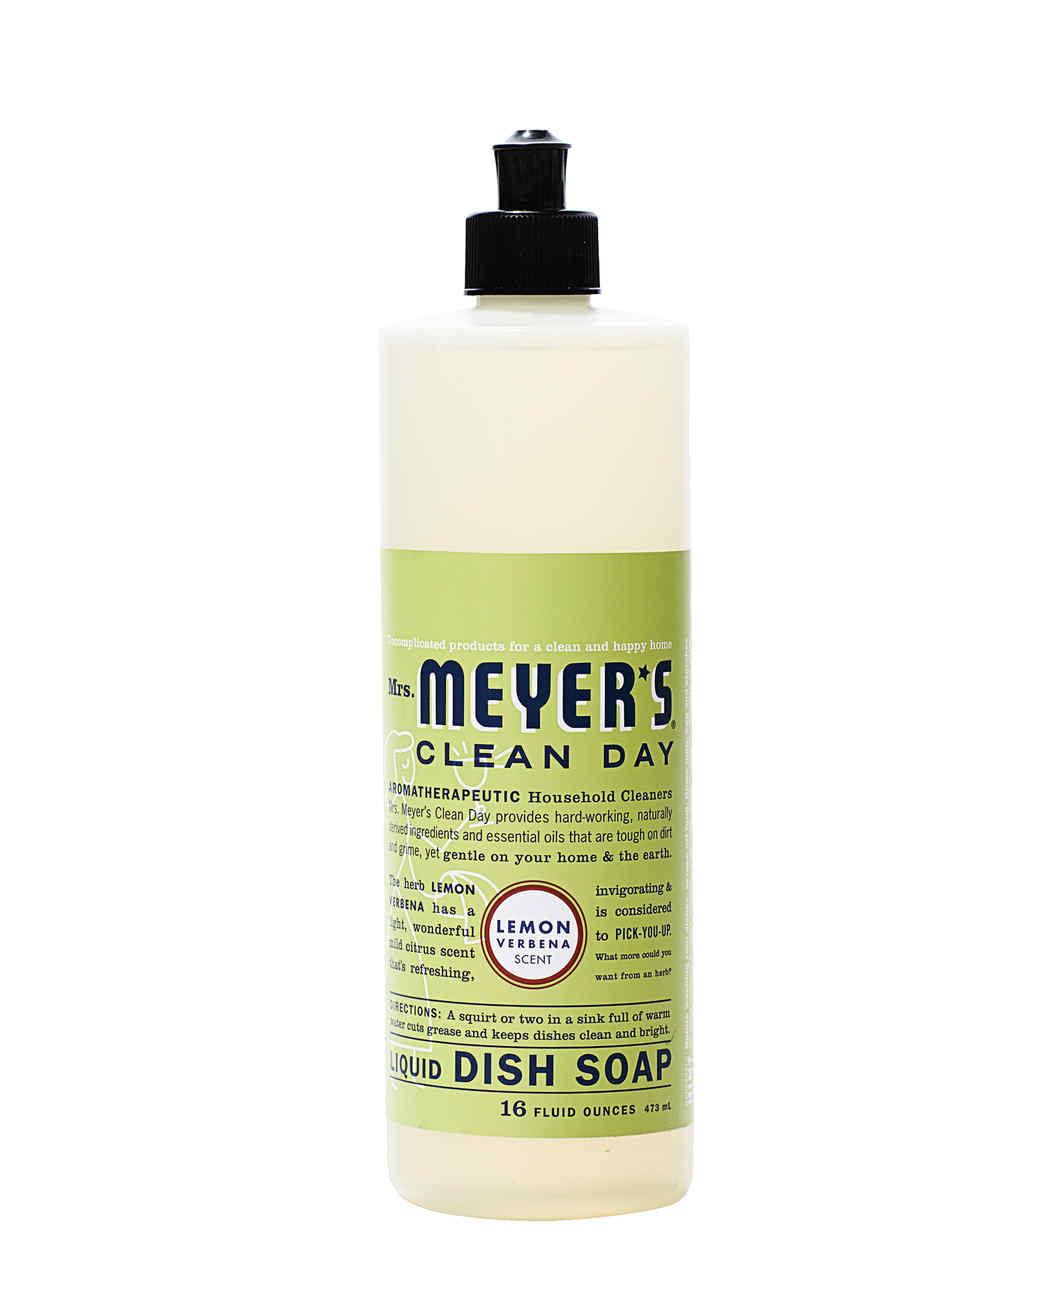 meyers-dish-soap-11-mld110972.jpg